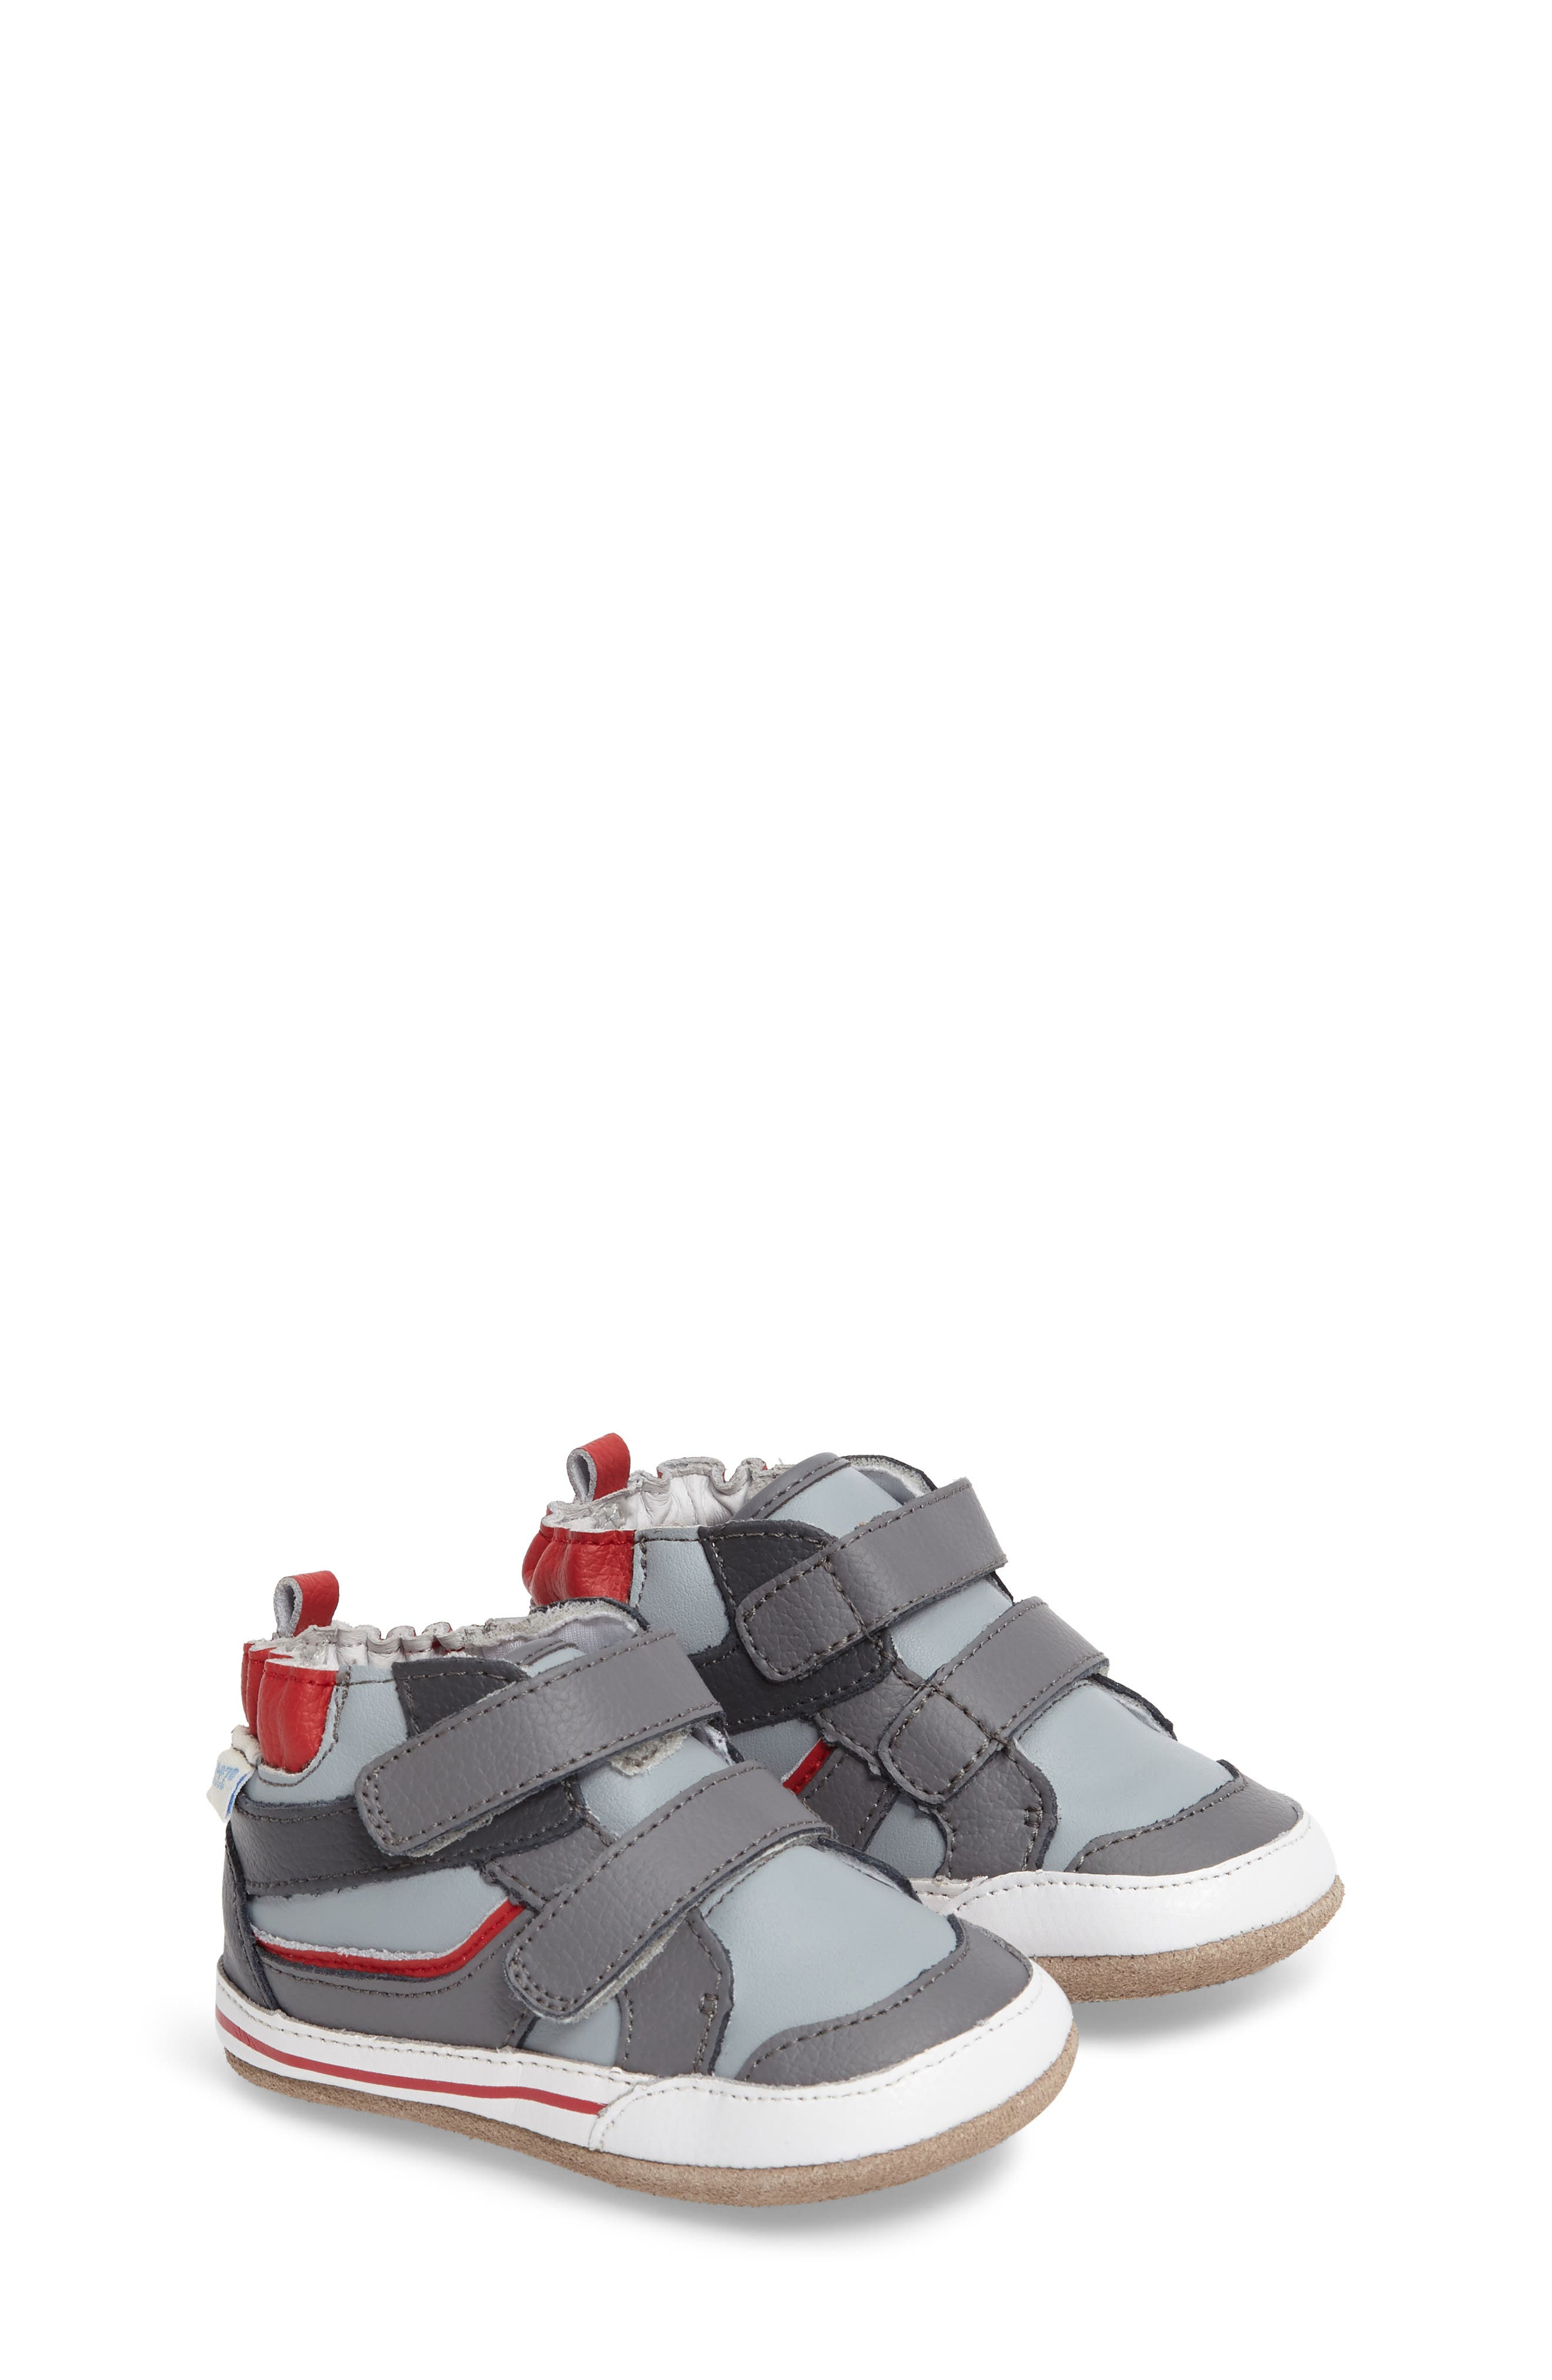 Greg Crib Shoe,                         Main,                         color, 020